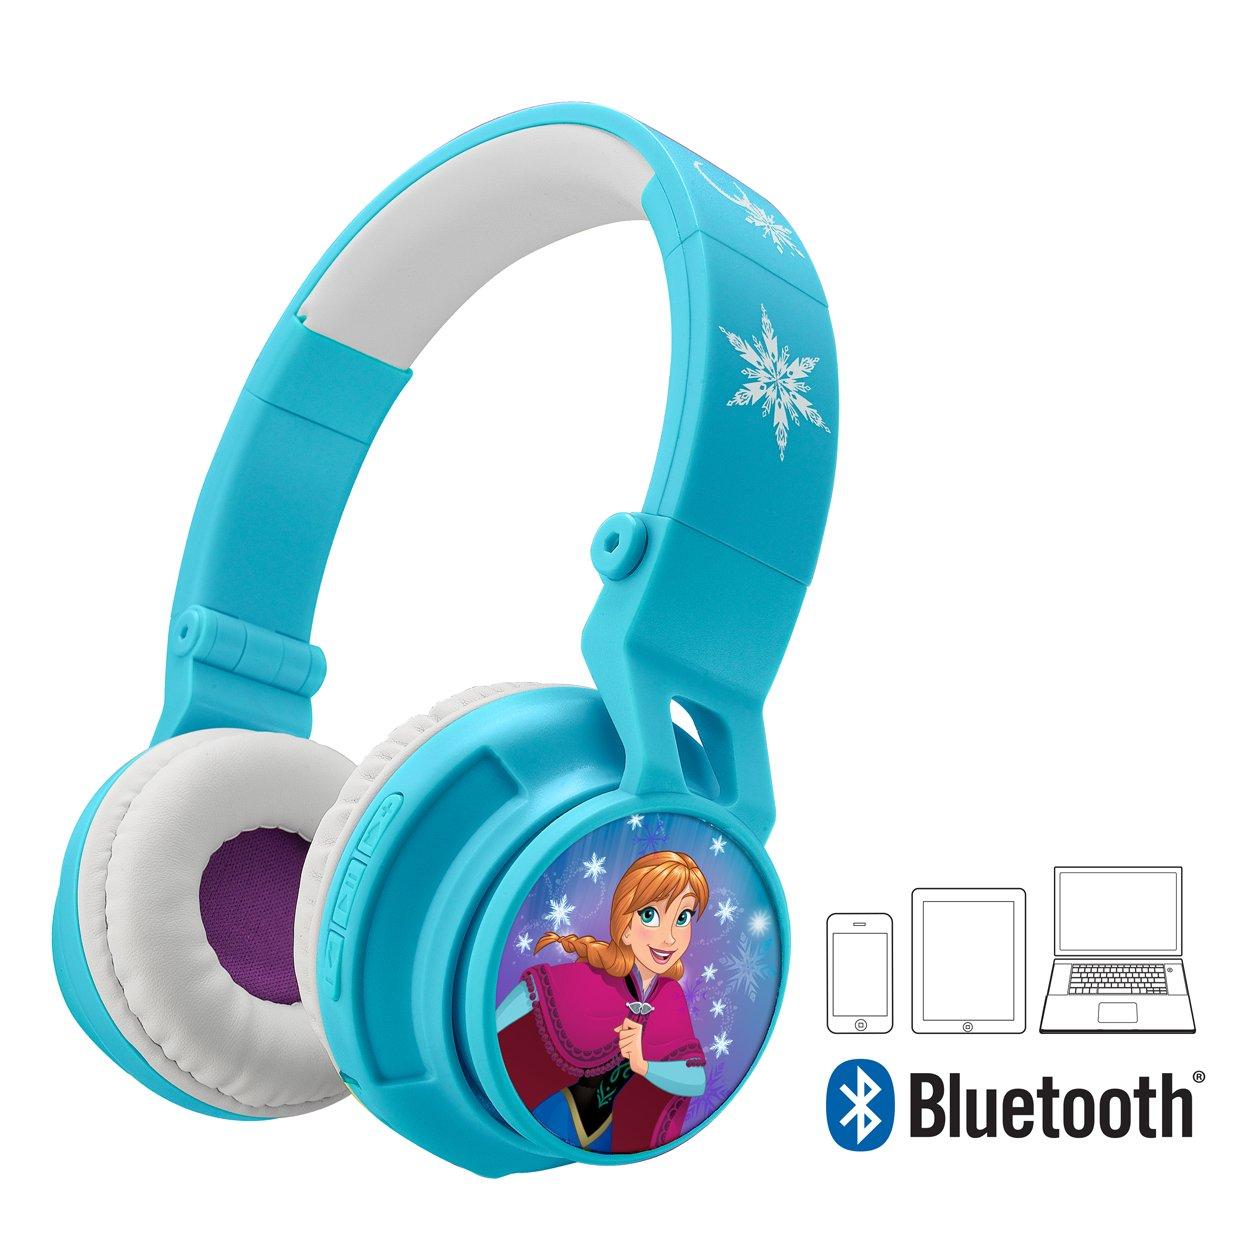 Bluetooth Headphones for Kids Wireless Rechargeable Kid